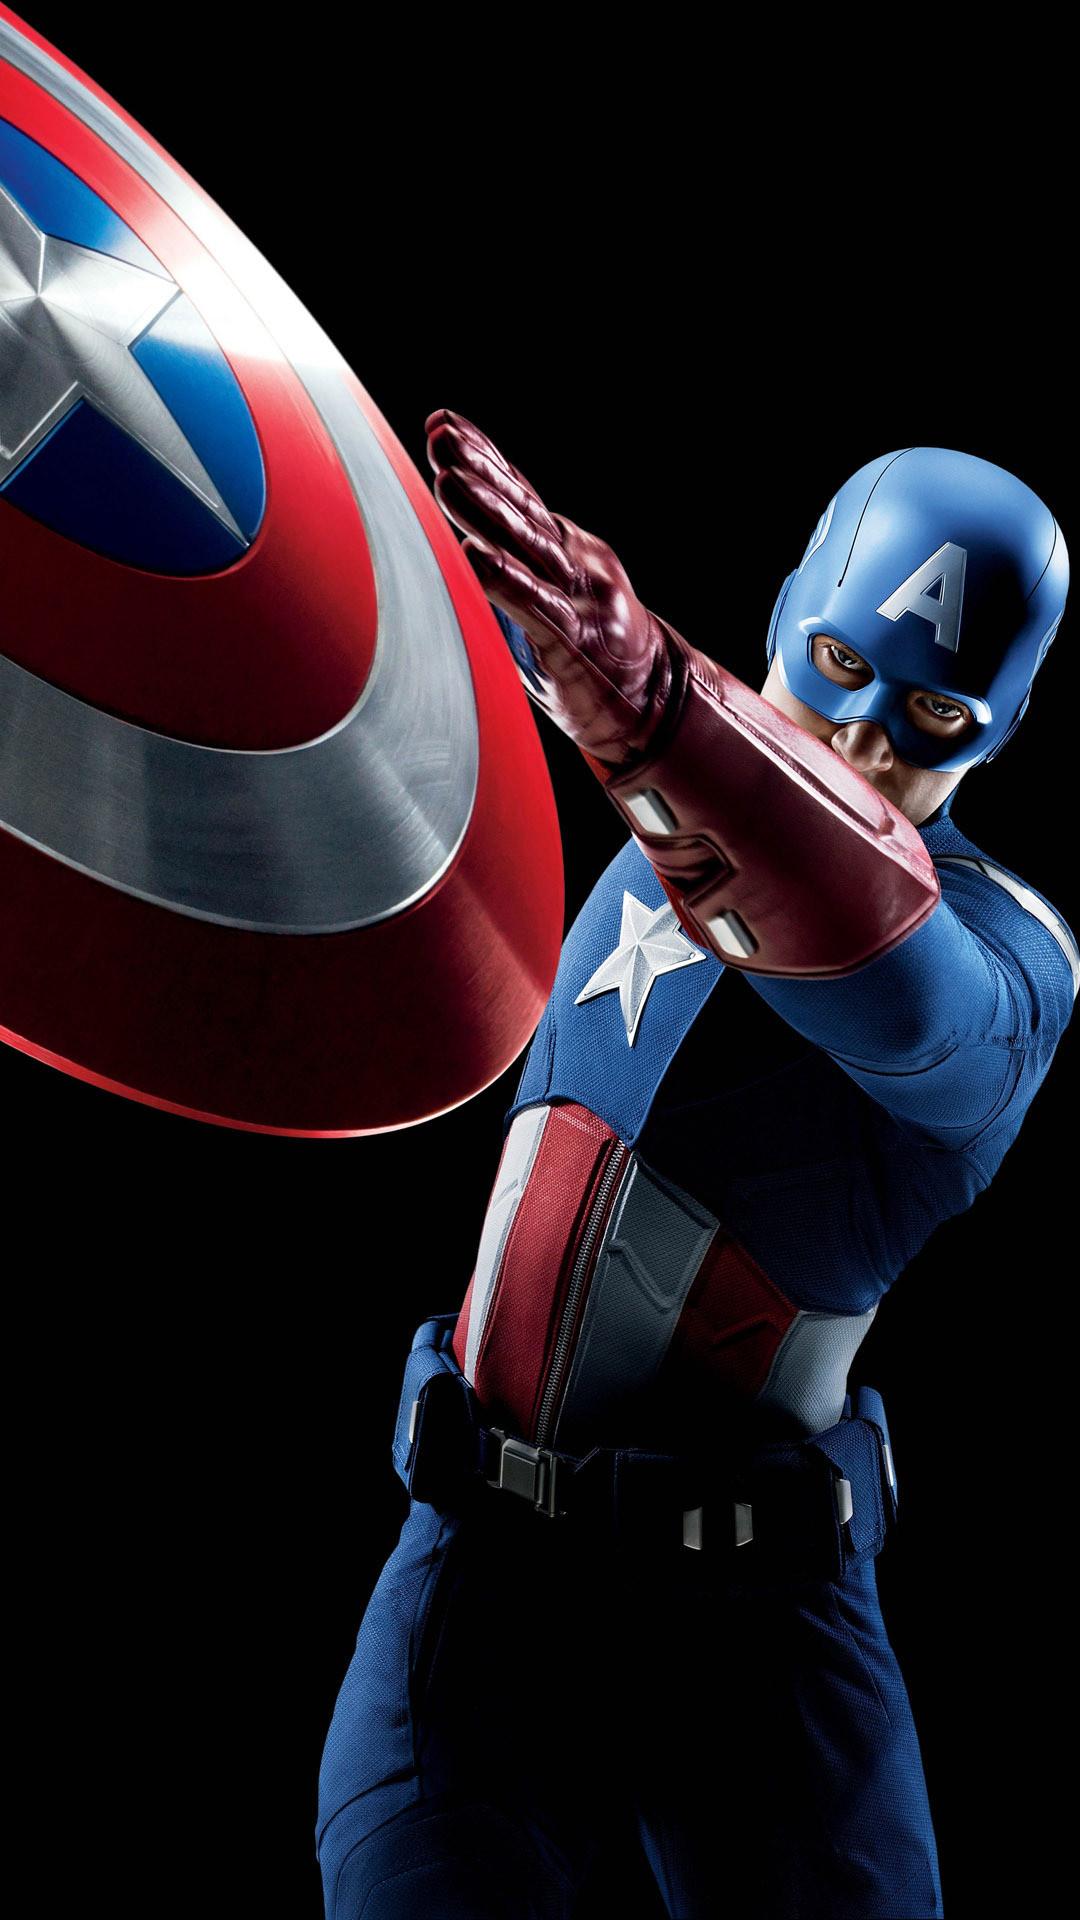 1080x1920 Captain Americmovie Mobile Wallpaper Captain America Wallpaper For Phone 1080x1920 Wallpaper Teahub Io